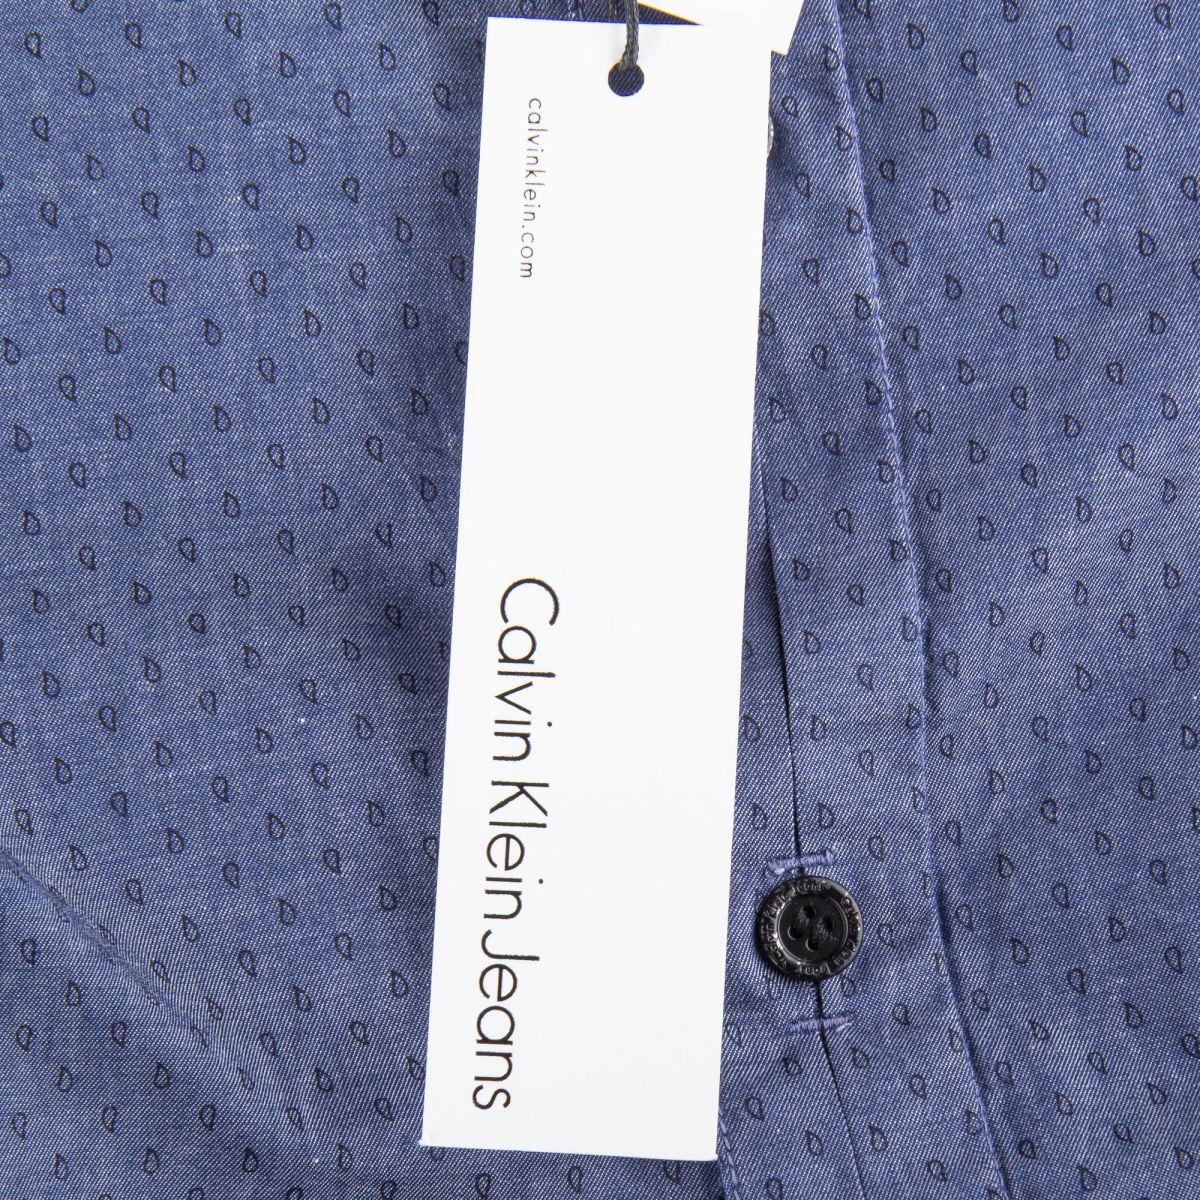 39c0245bcda chemise-bleue-imprimee-manches-longues-homme-calvin-klein.jpg